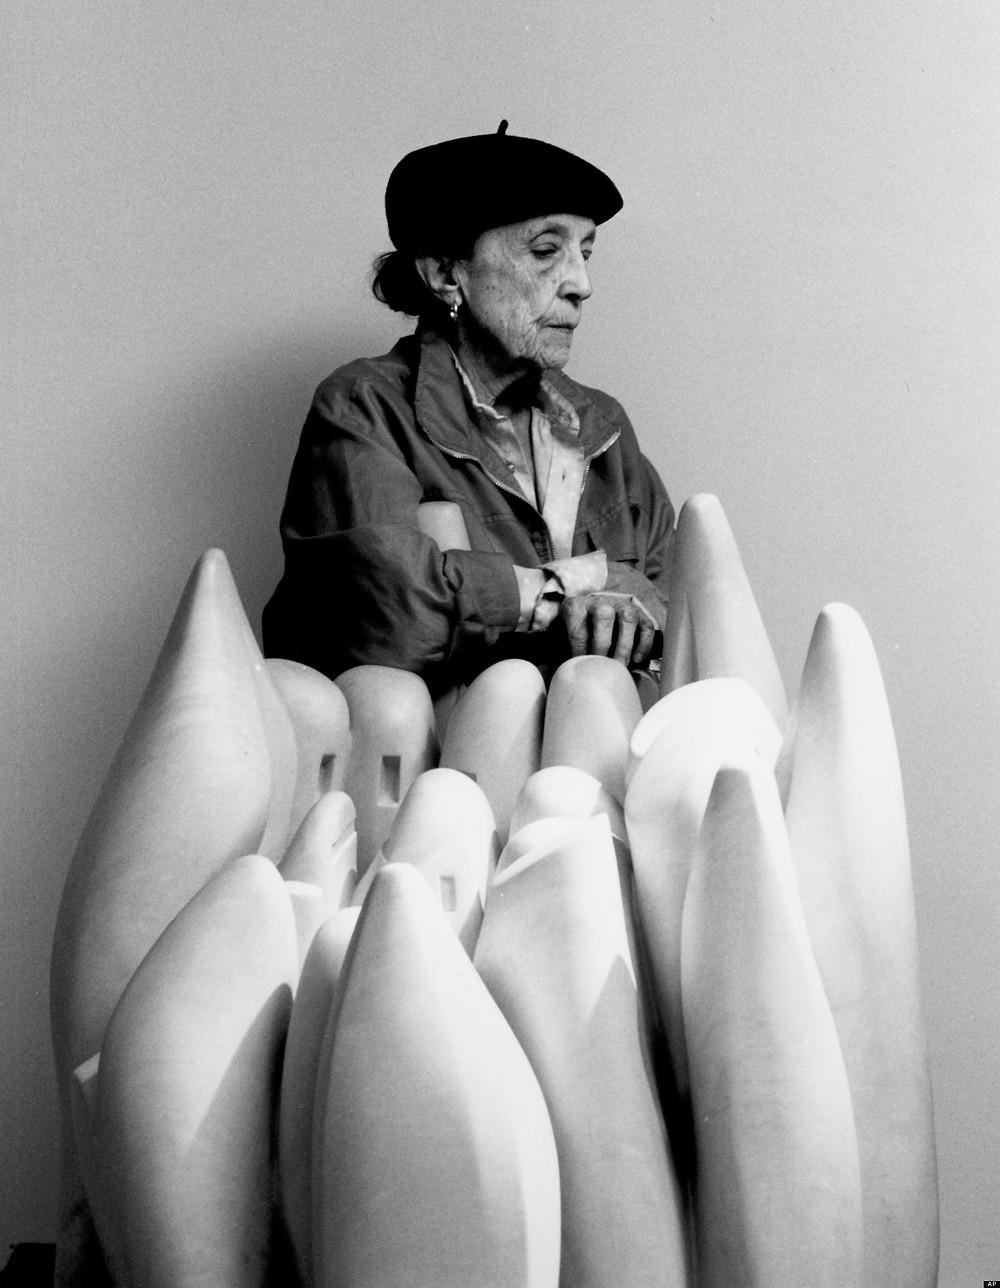 Louise Bourgeois avec sa sculpture Eye to Eye (1970) par Raimon Ramis, 1990.